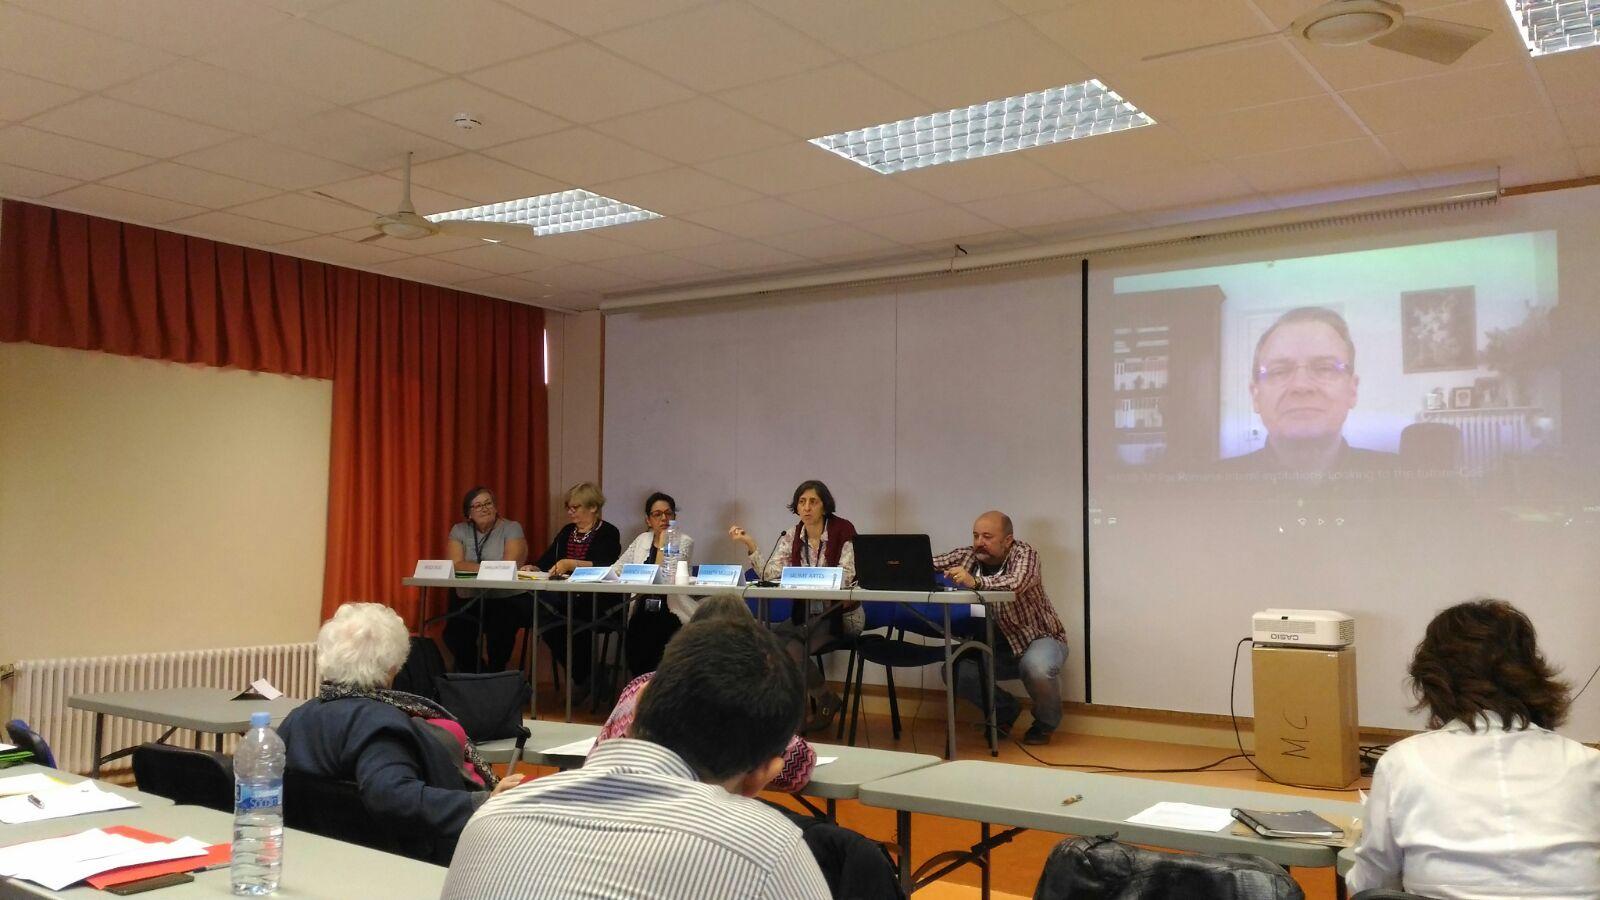 asamblea-plenaria-icmica-miic-pax-romana-2016-profesionales-cristianos-equipo-permanente-5